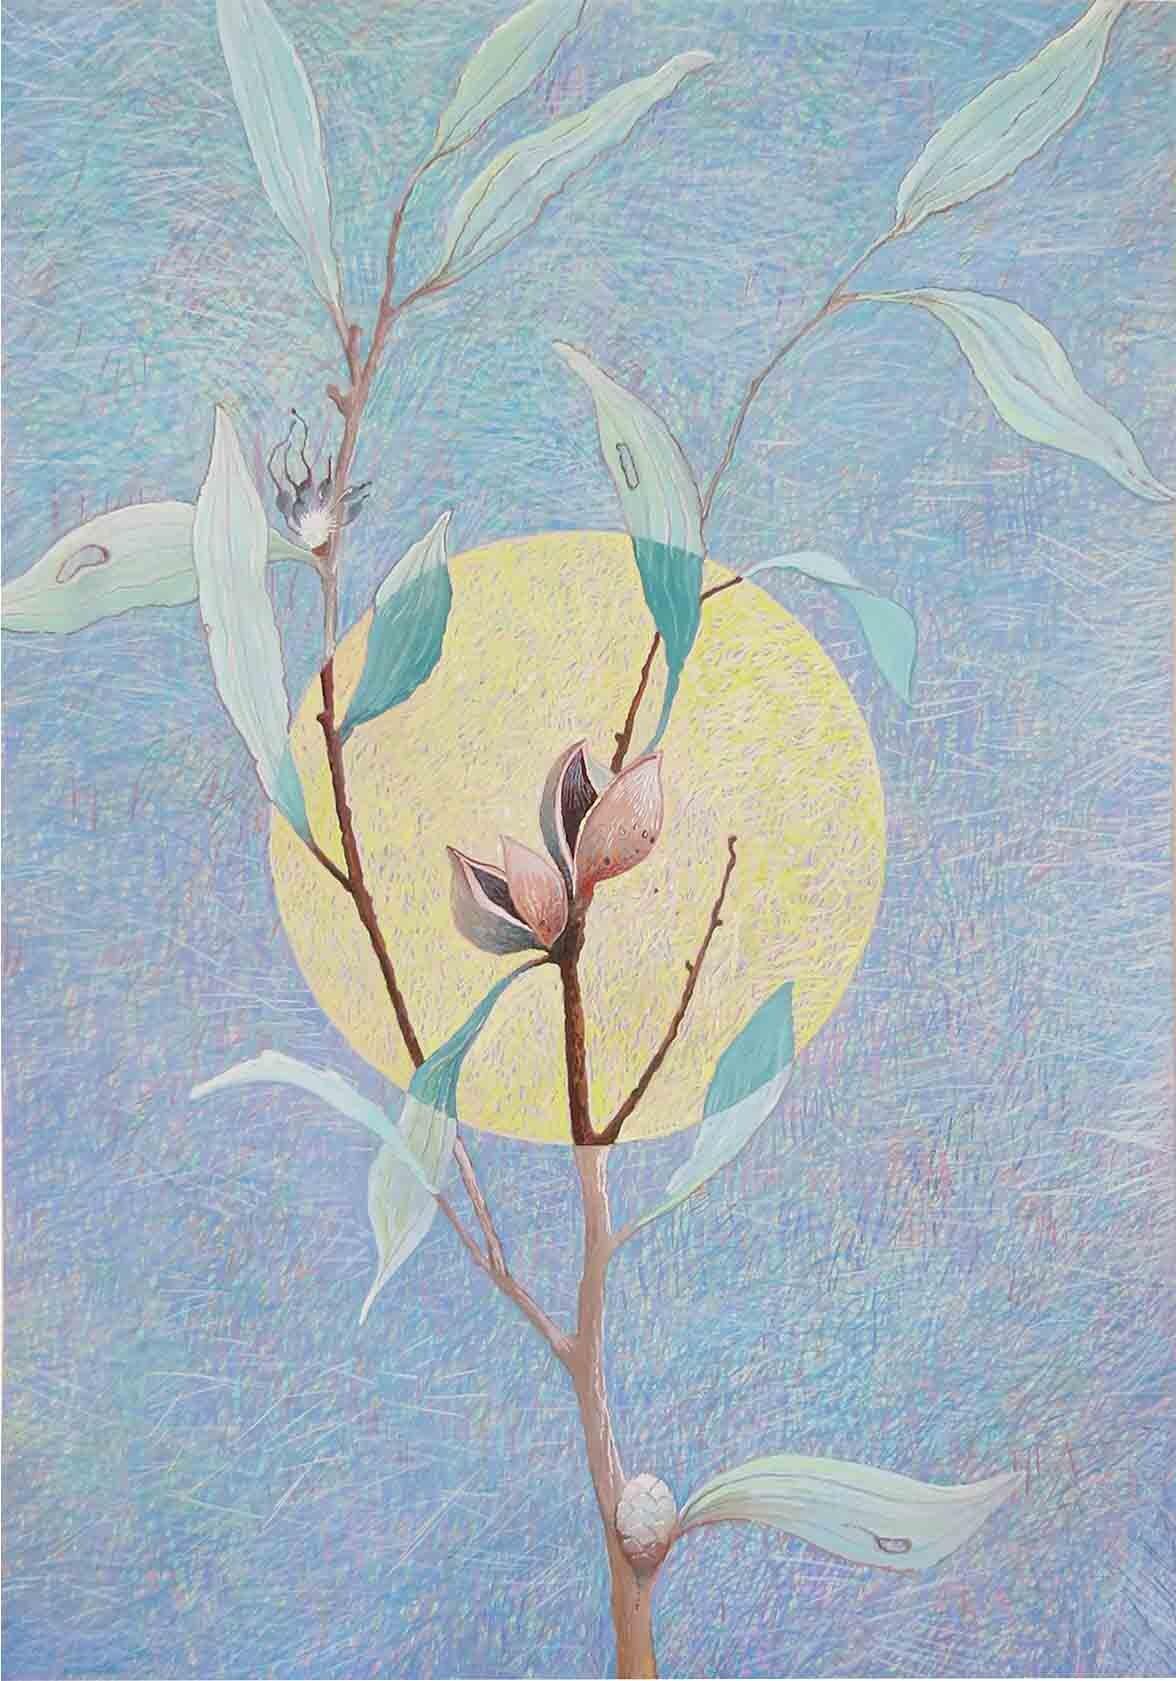 47. Peter Dailey, Pincushion Hakea, 2019, gouache on paper, 42 x 29.7 cm $350